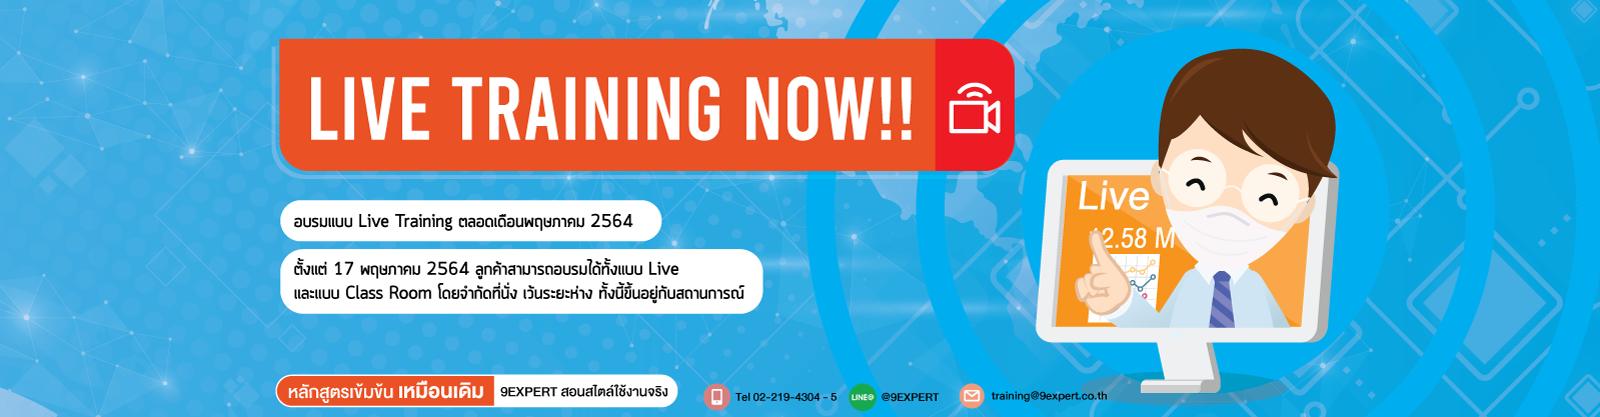 Live Training Now!! อบรมแบบ Live Training ตลอดเดือนพฤษภาคม 2564